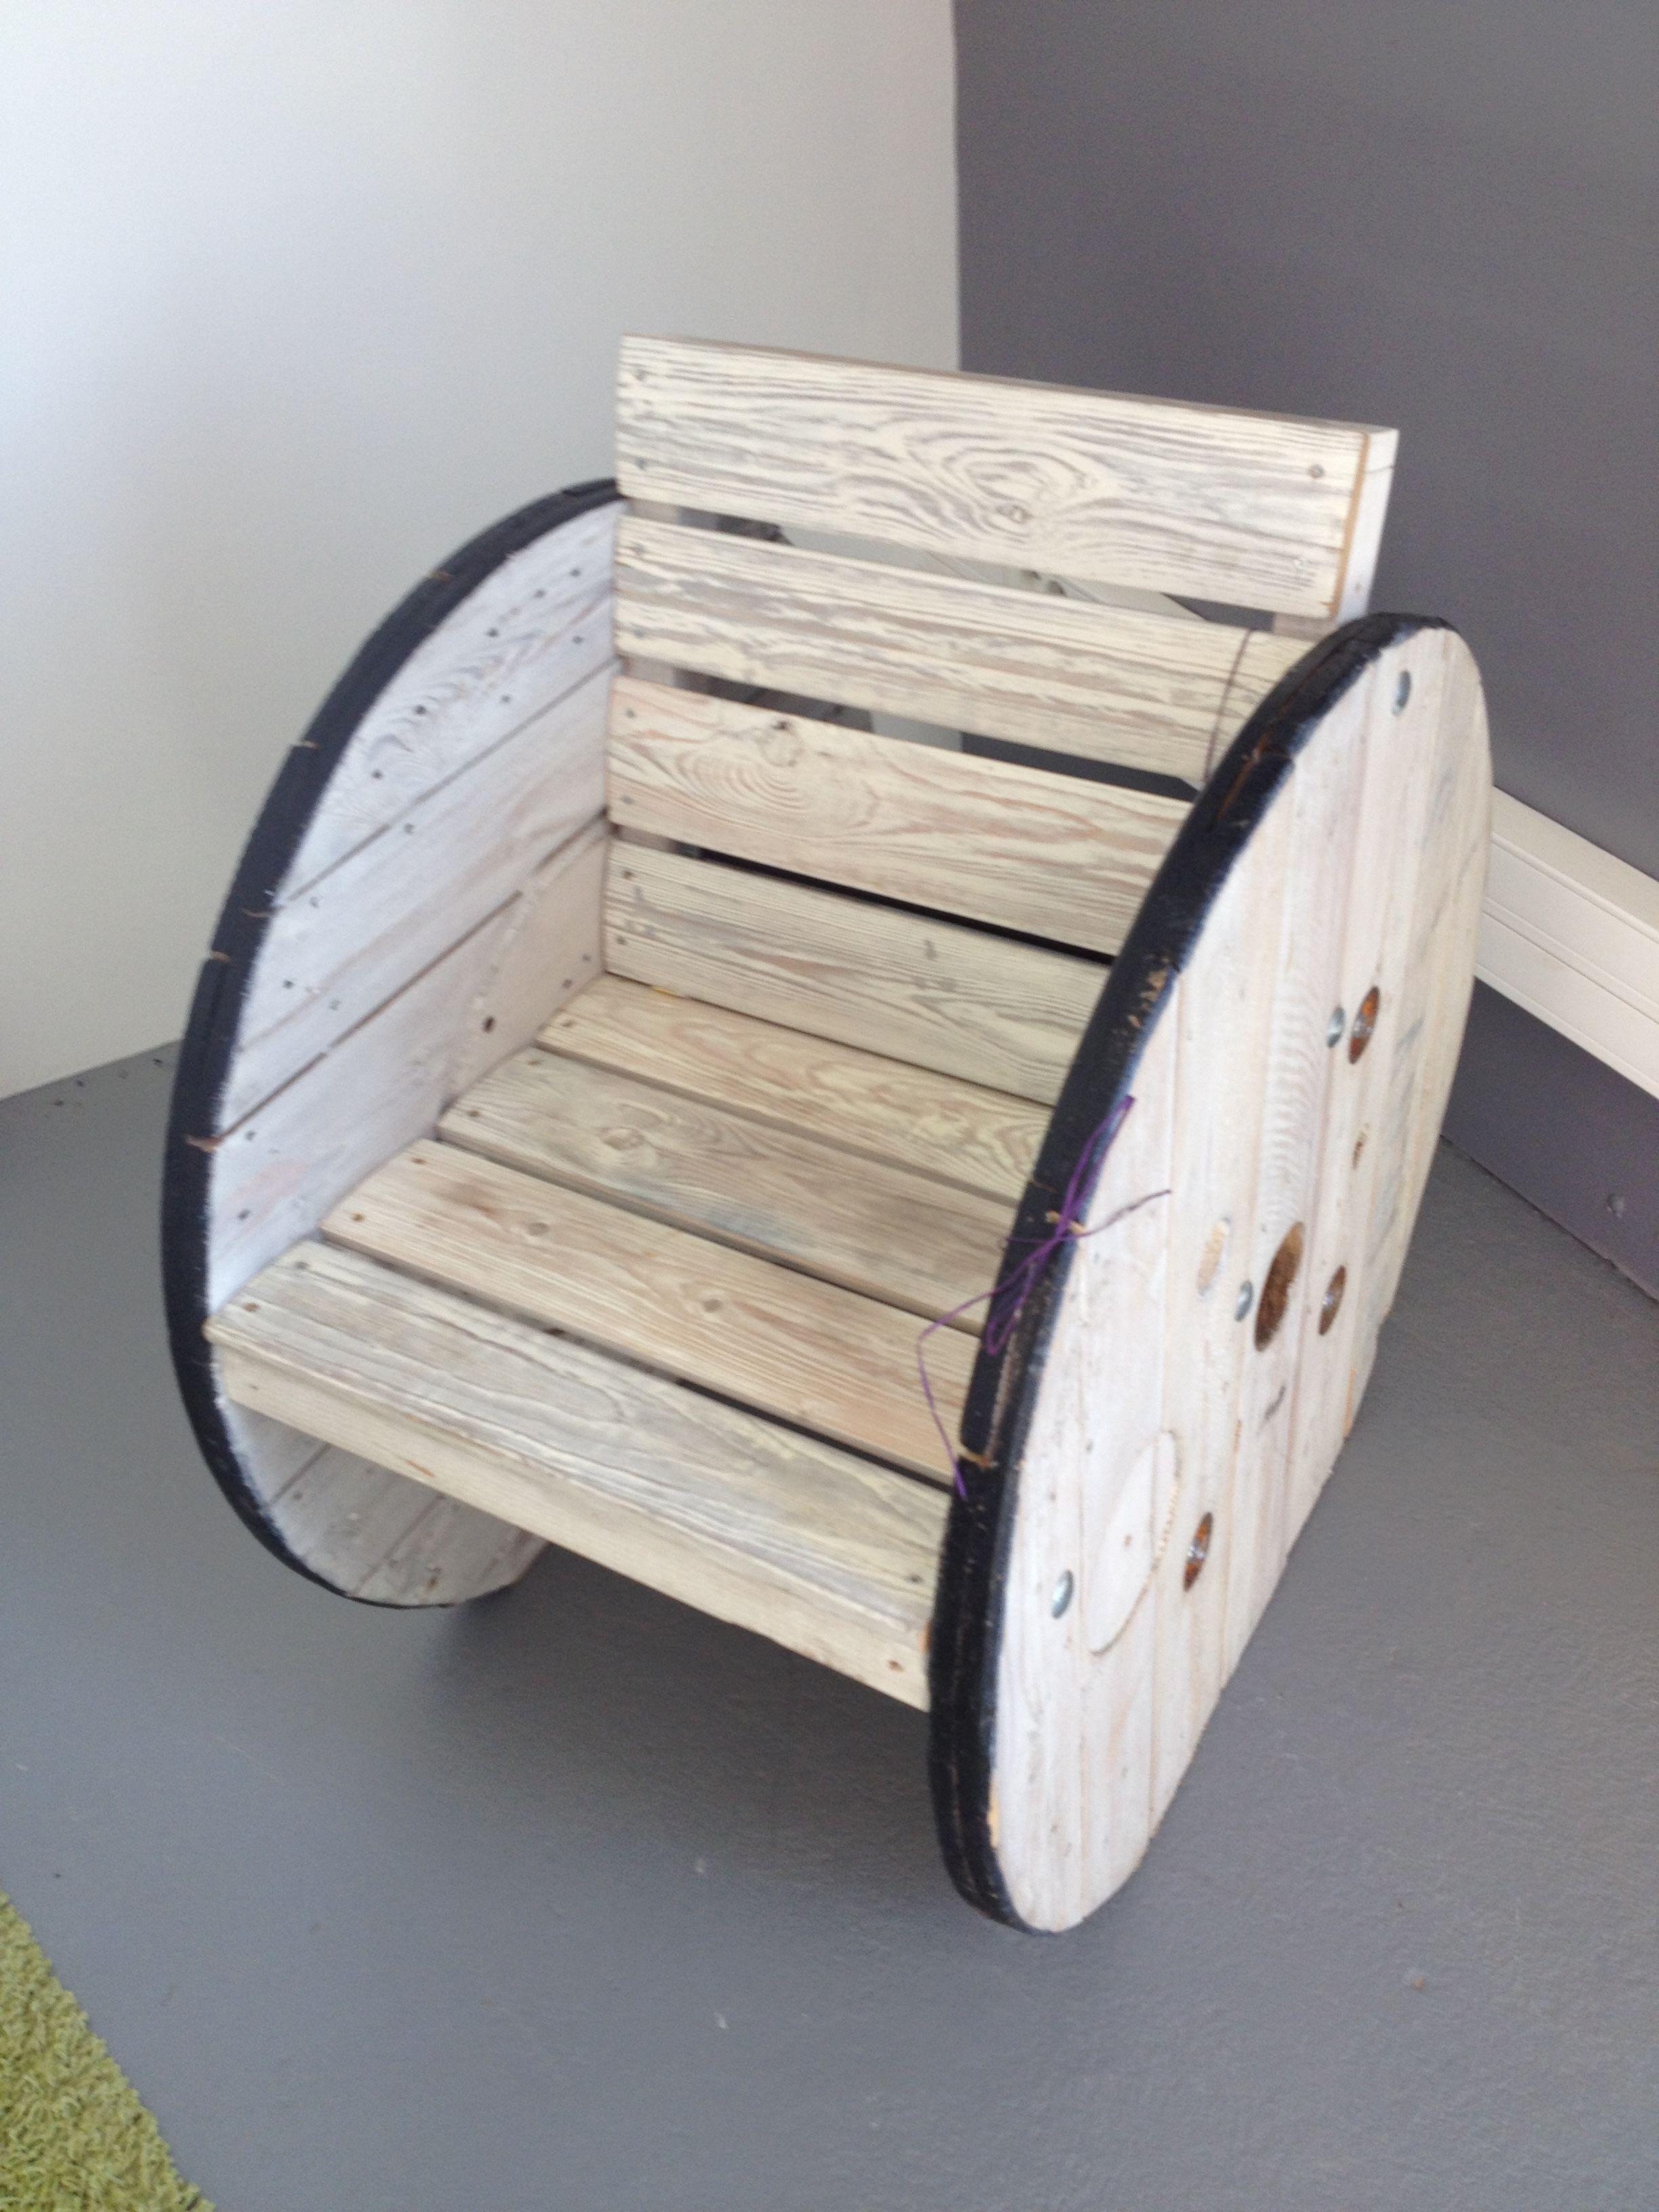 fauteuil touret blanc association valoris diy pinterest pallets woods and pallet furniture. Black Bedroom Furniture Sets. Home Design Ideas